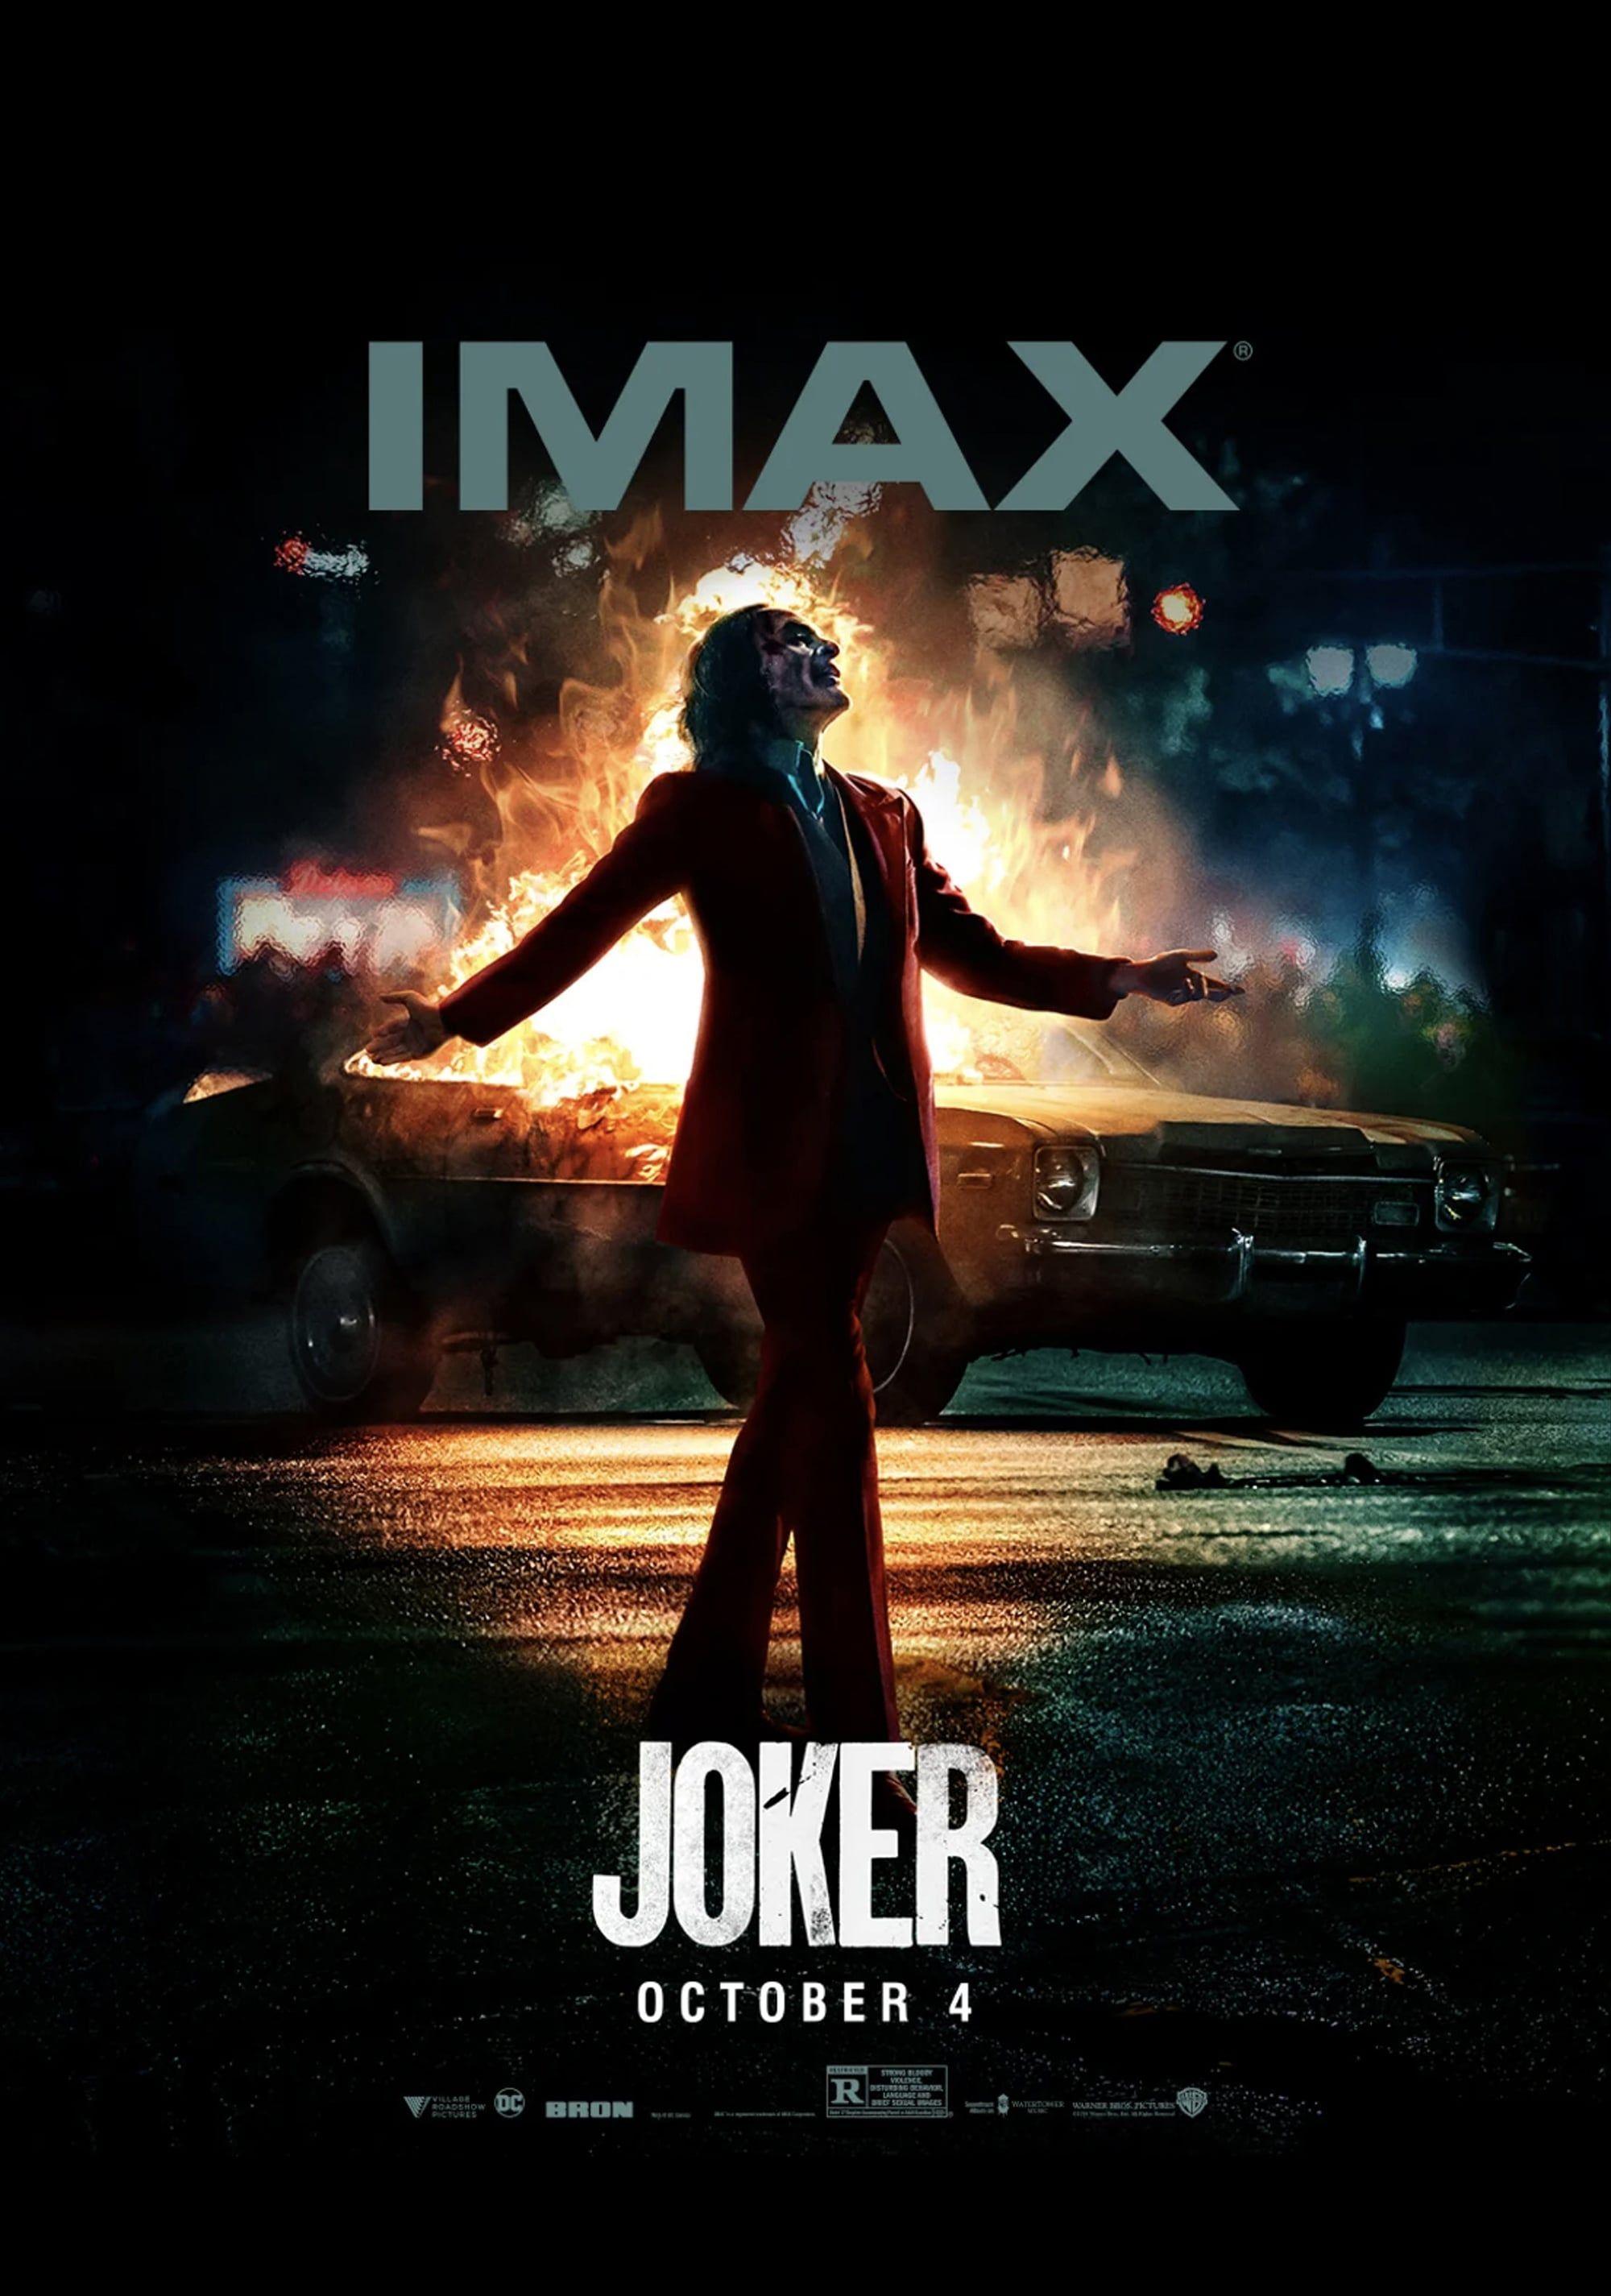 Pin De Kathrynleverett En Joker Joker Peliculas De Superheroes Películas Completas